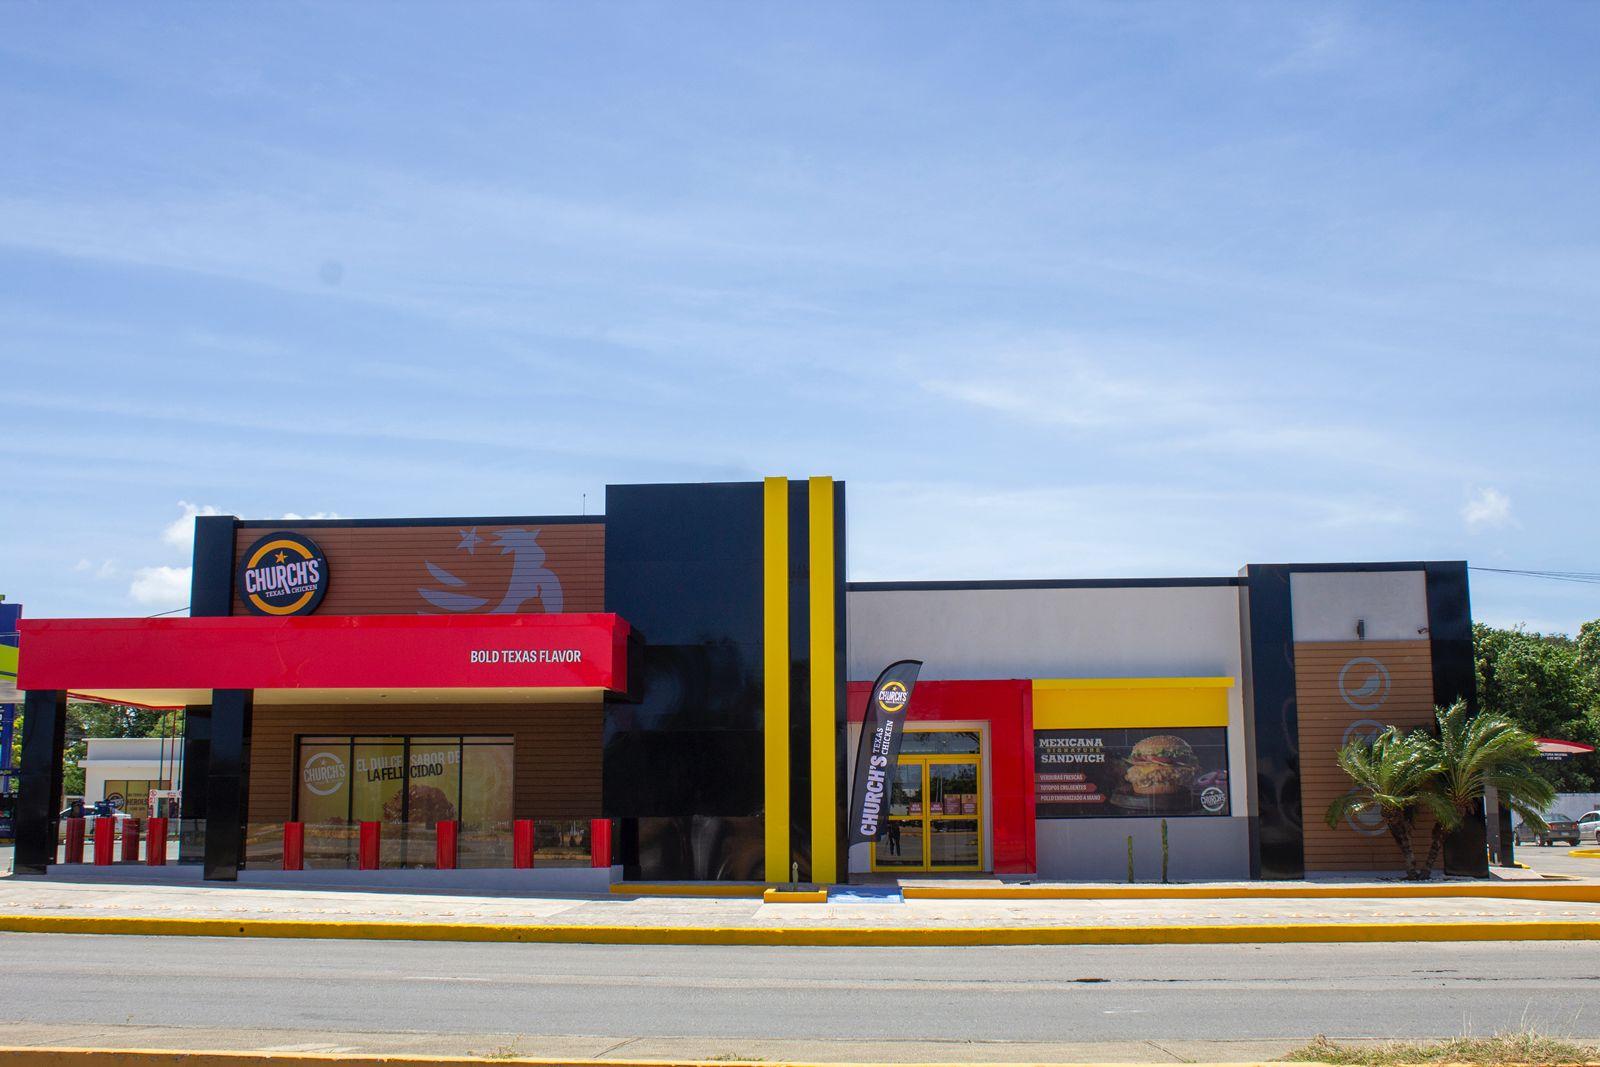 Church's Chicken Announces Promotion of Russ Sumrall to SVP, International Strategic Development